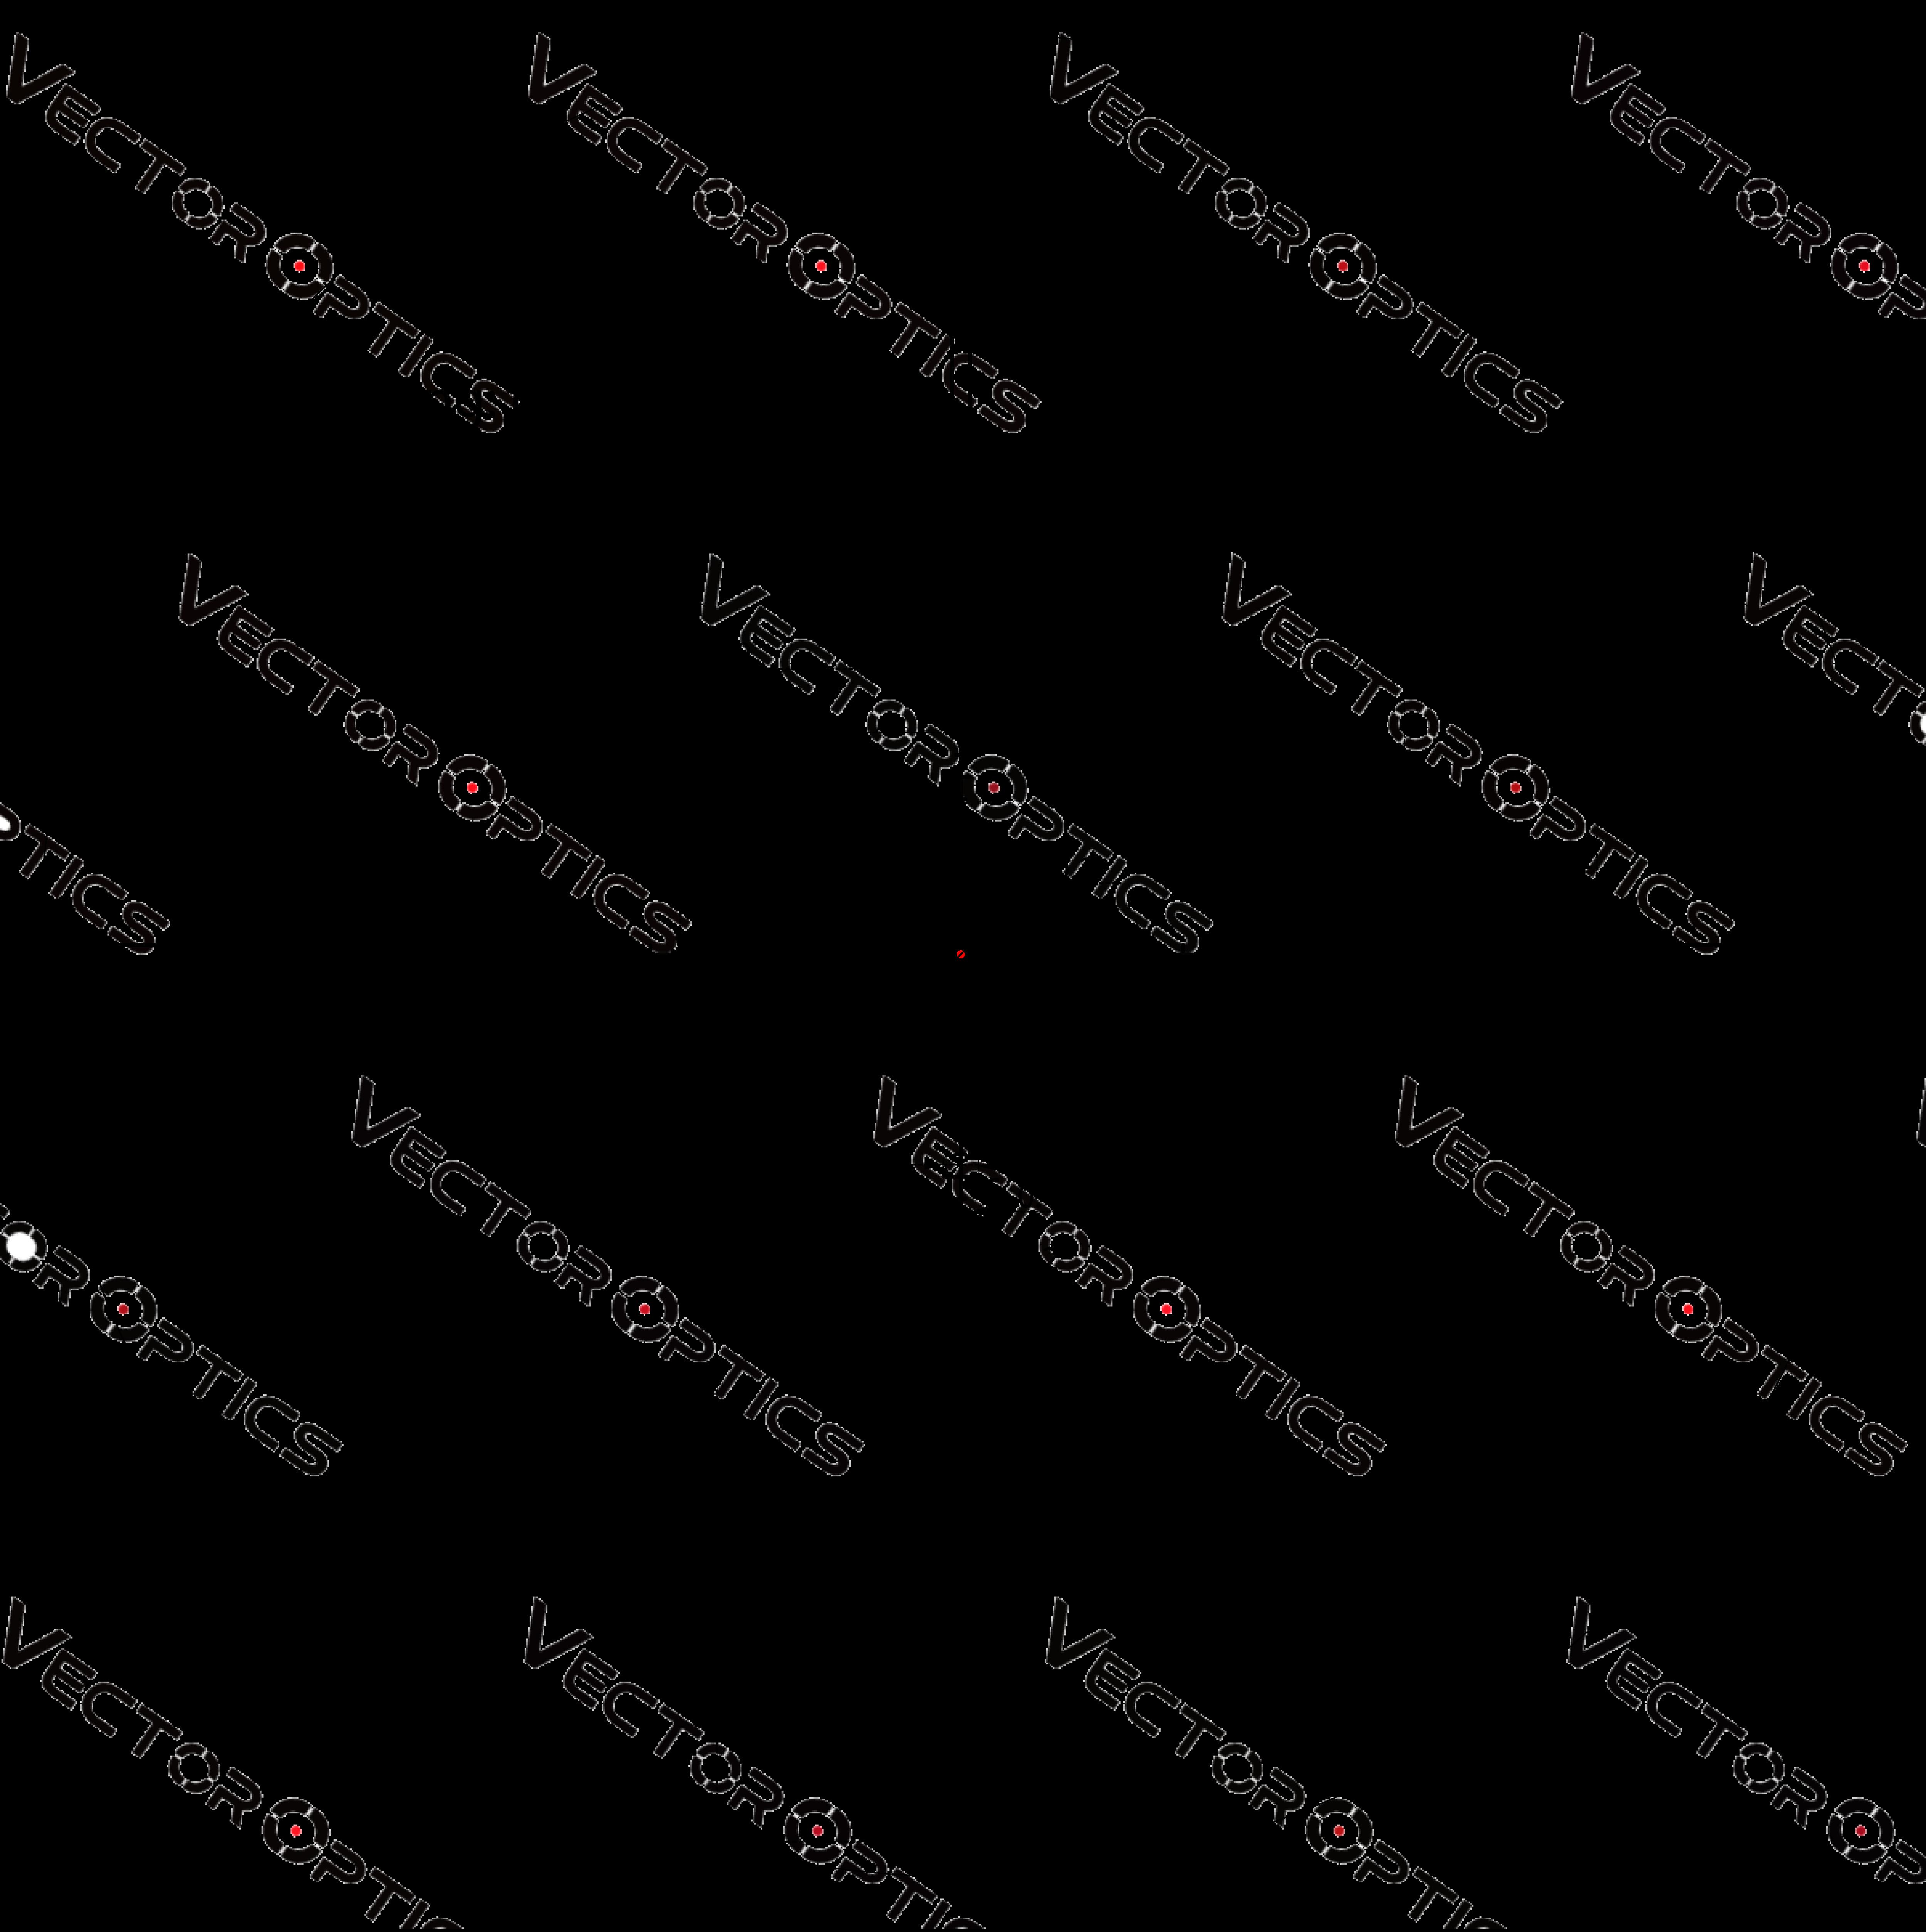 Veyron 6-24x44 FFP Riflescope Illuminated long sight